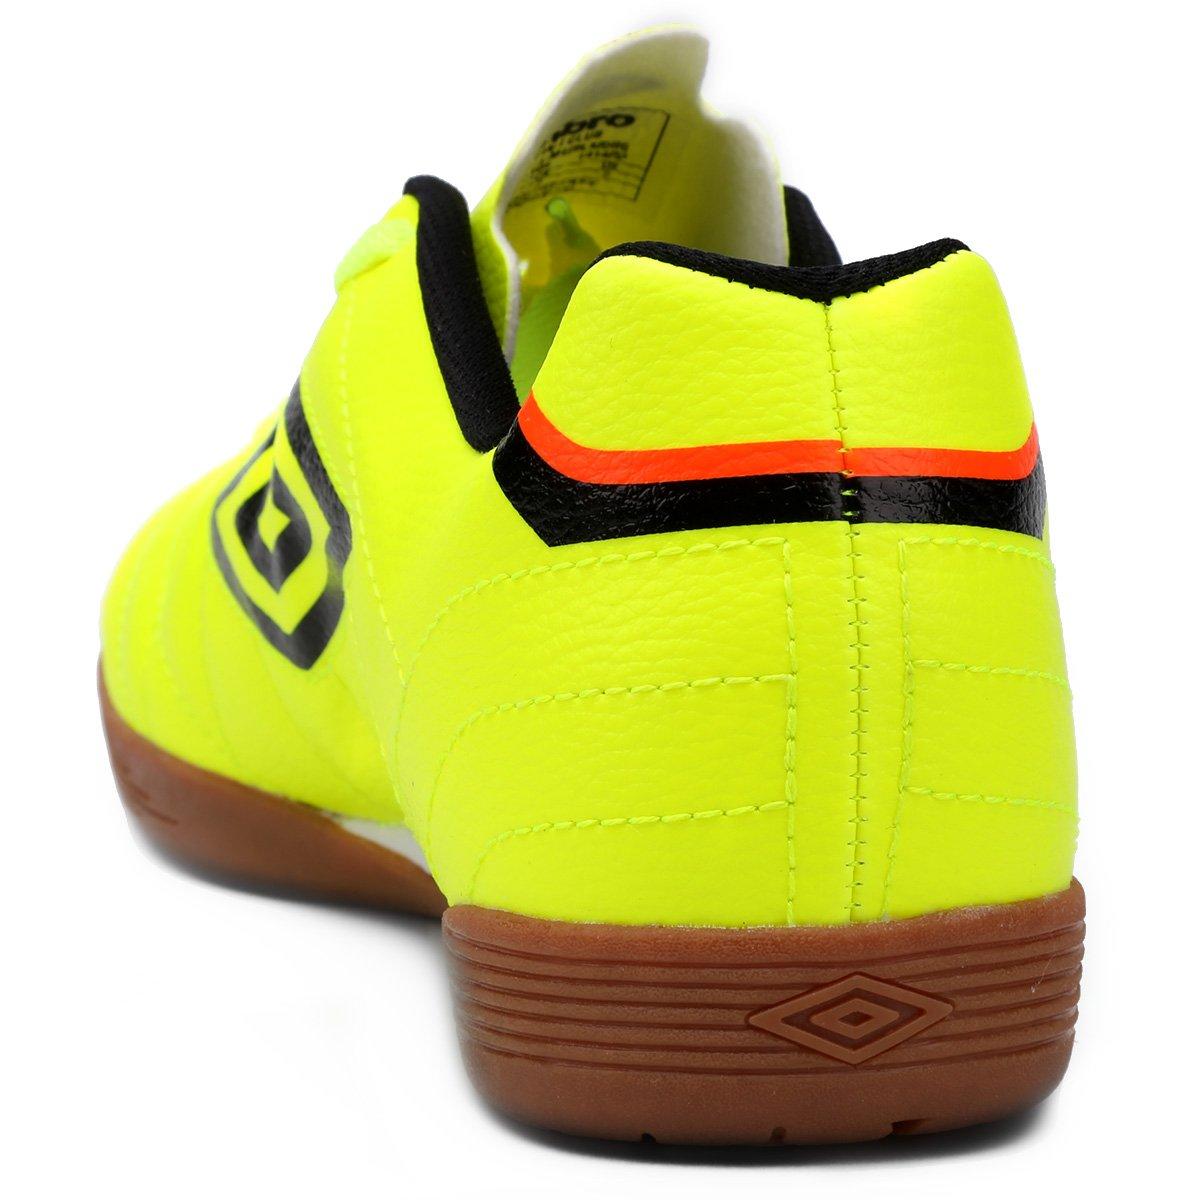 19c8f64045 ... 562aa1827be Chuteira Futsal Umbro Box Masculina Source · Chuteira  Futsal Umbro Speciali Club Masculina Compre Agora ...